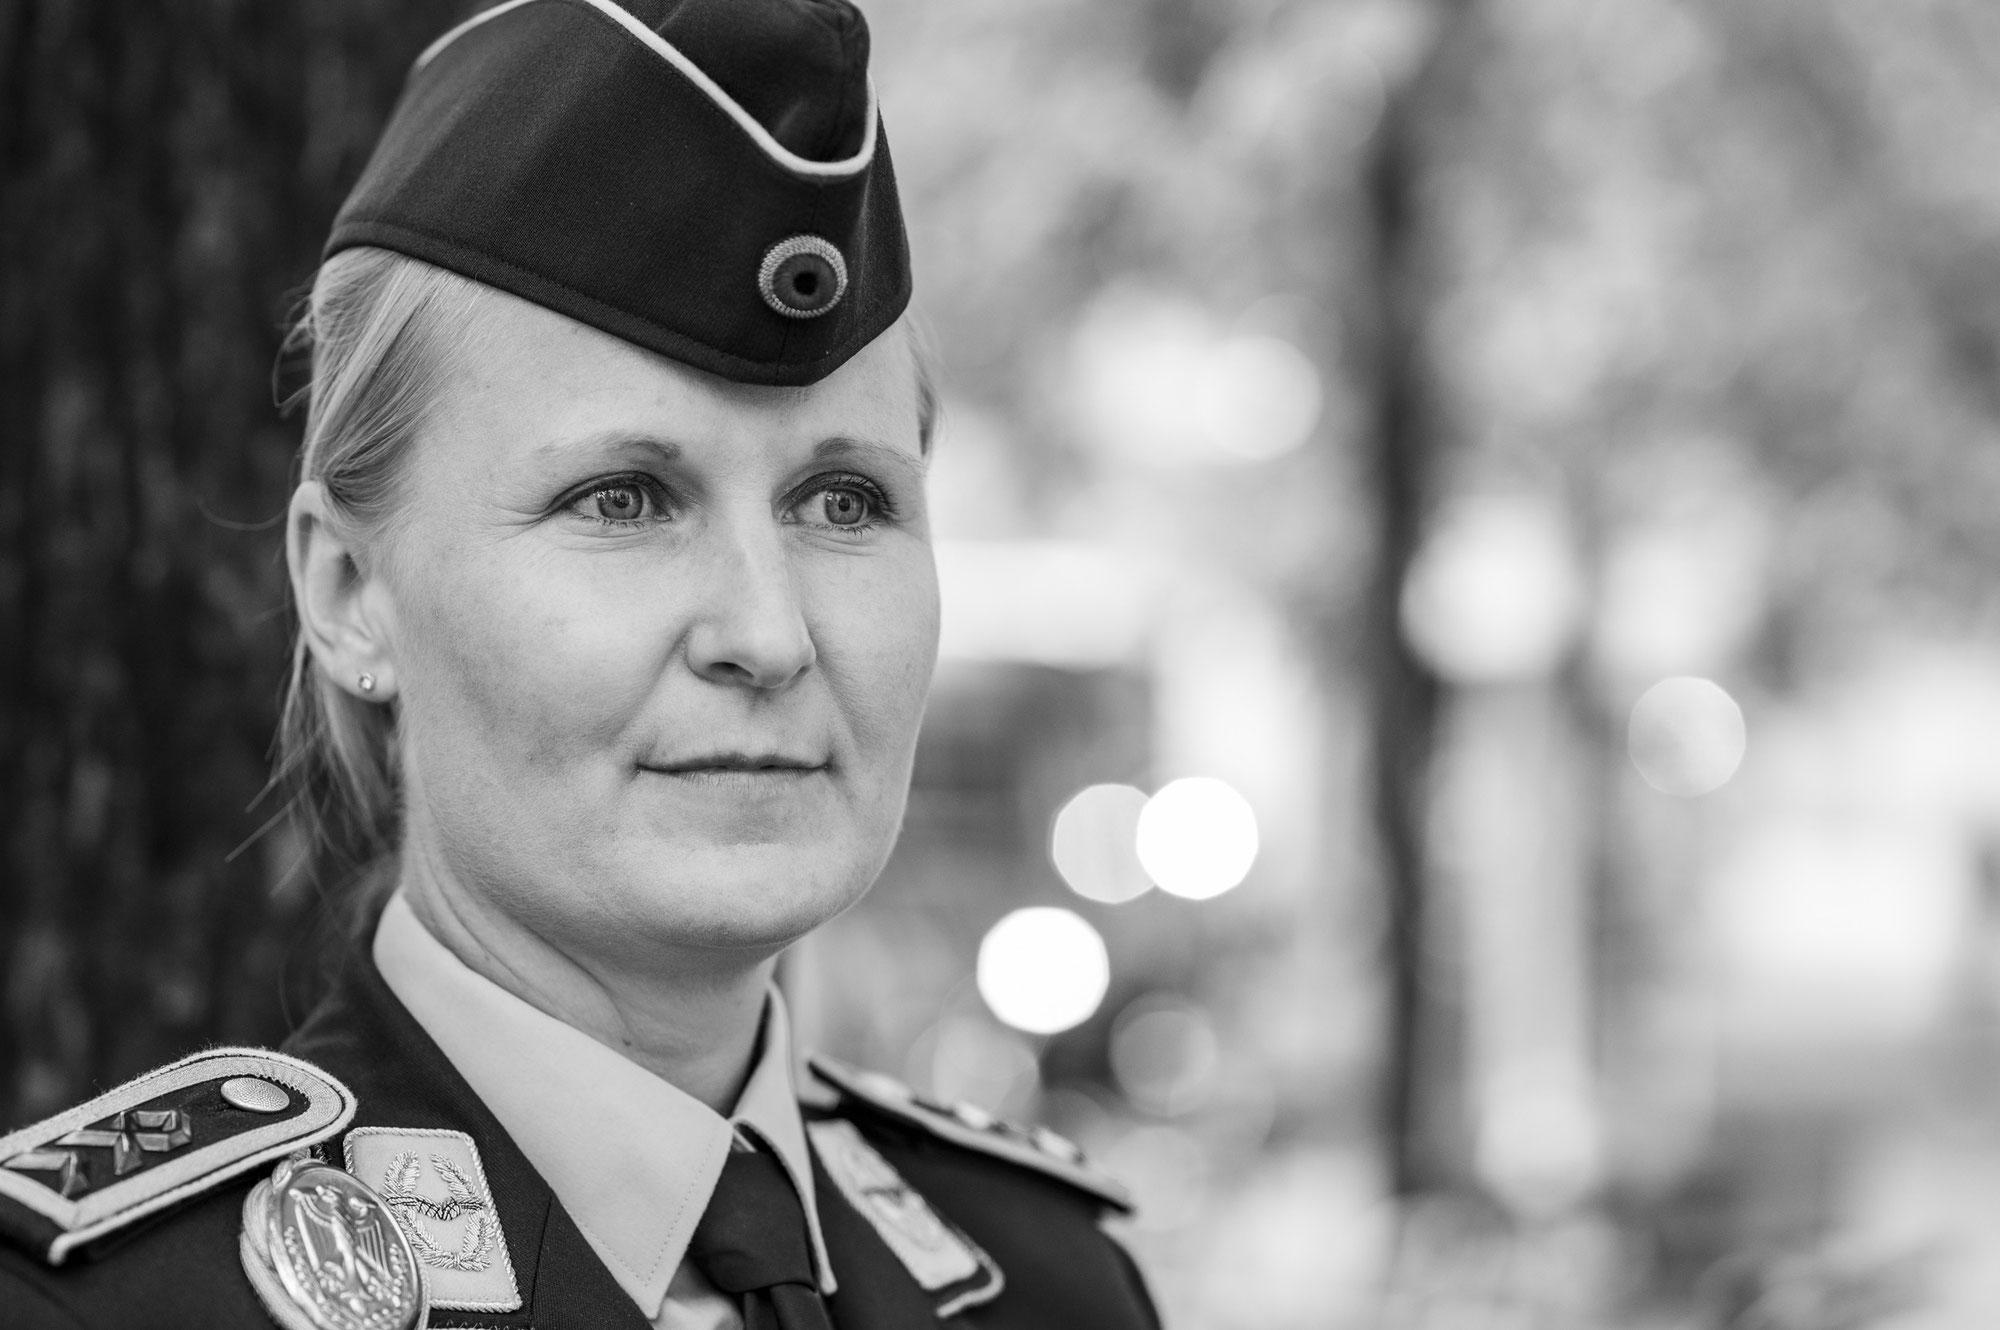 Veteran Insa Eckert